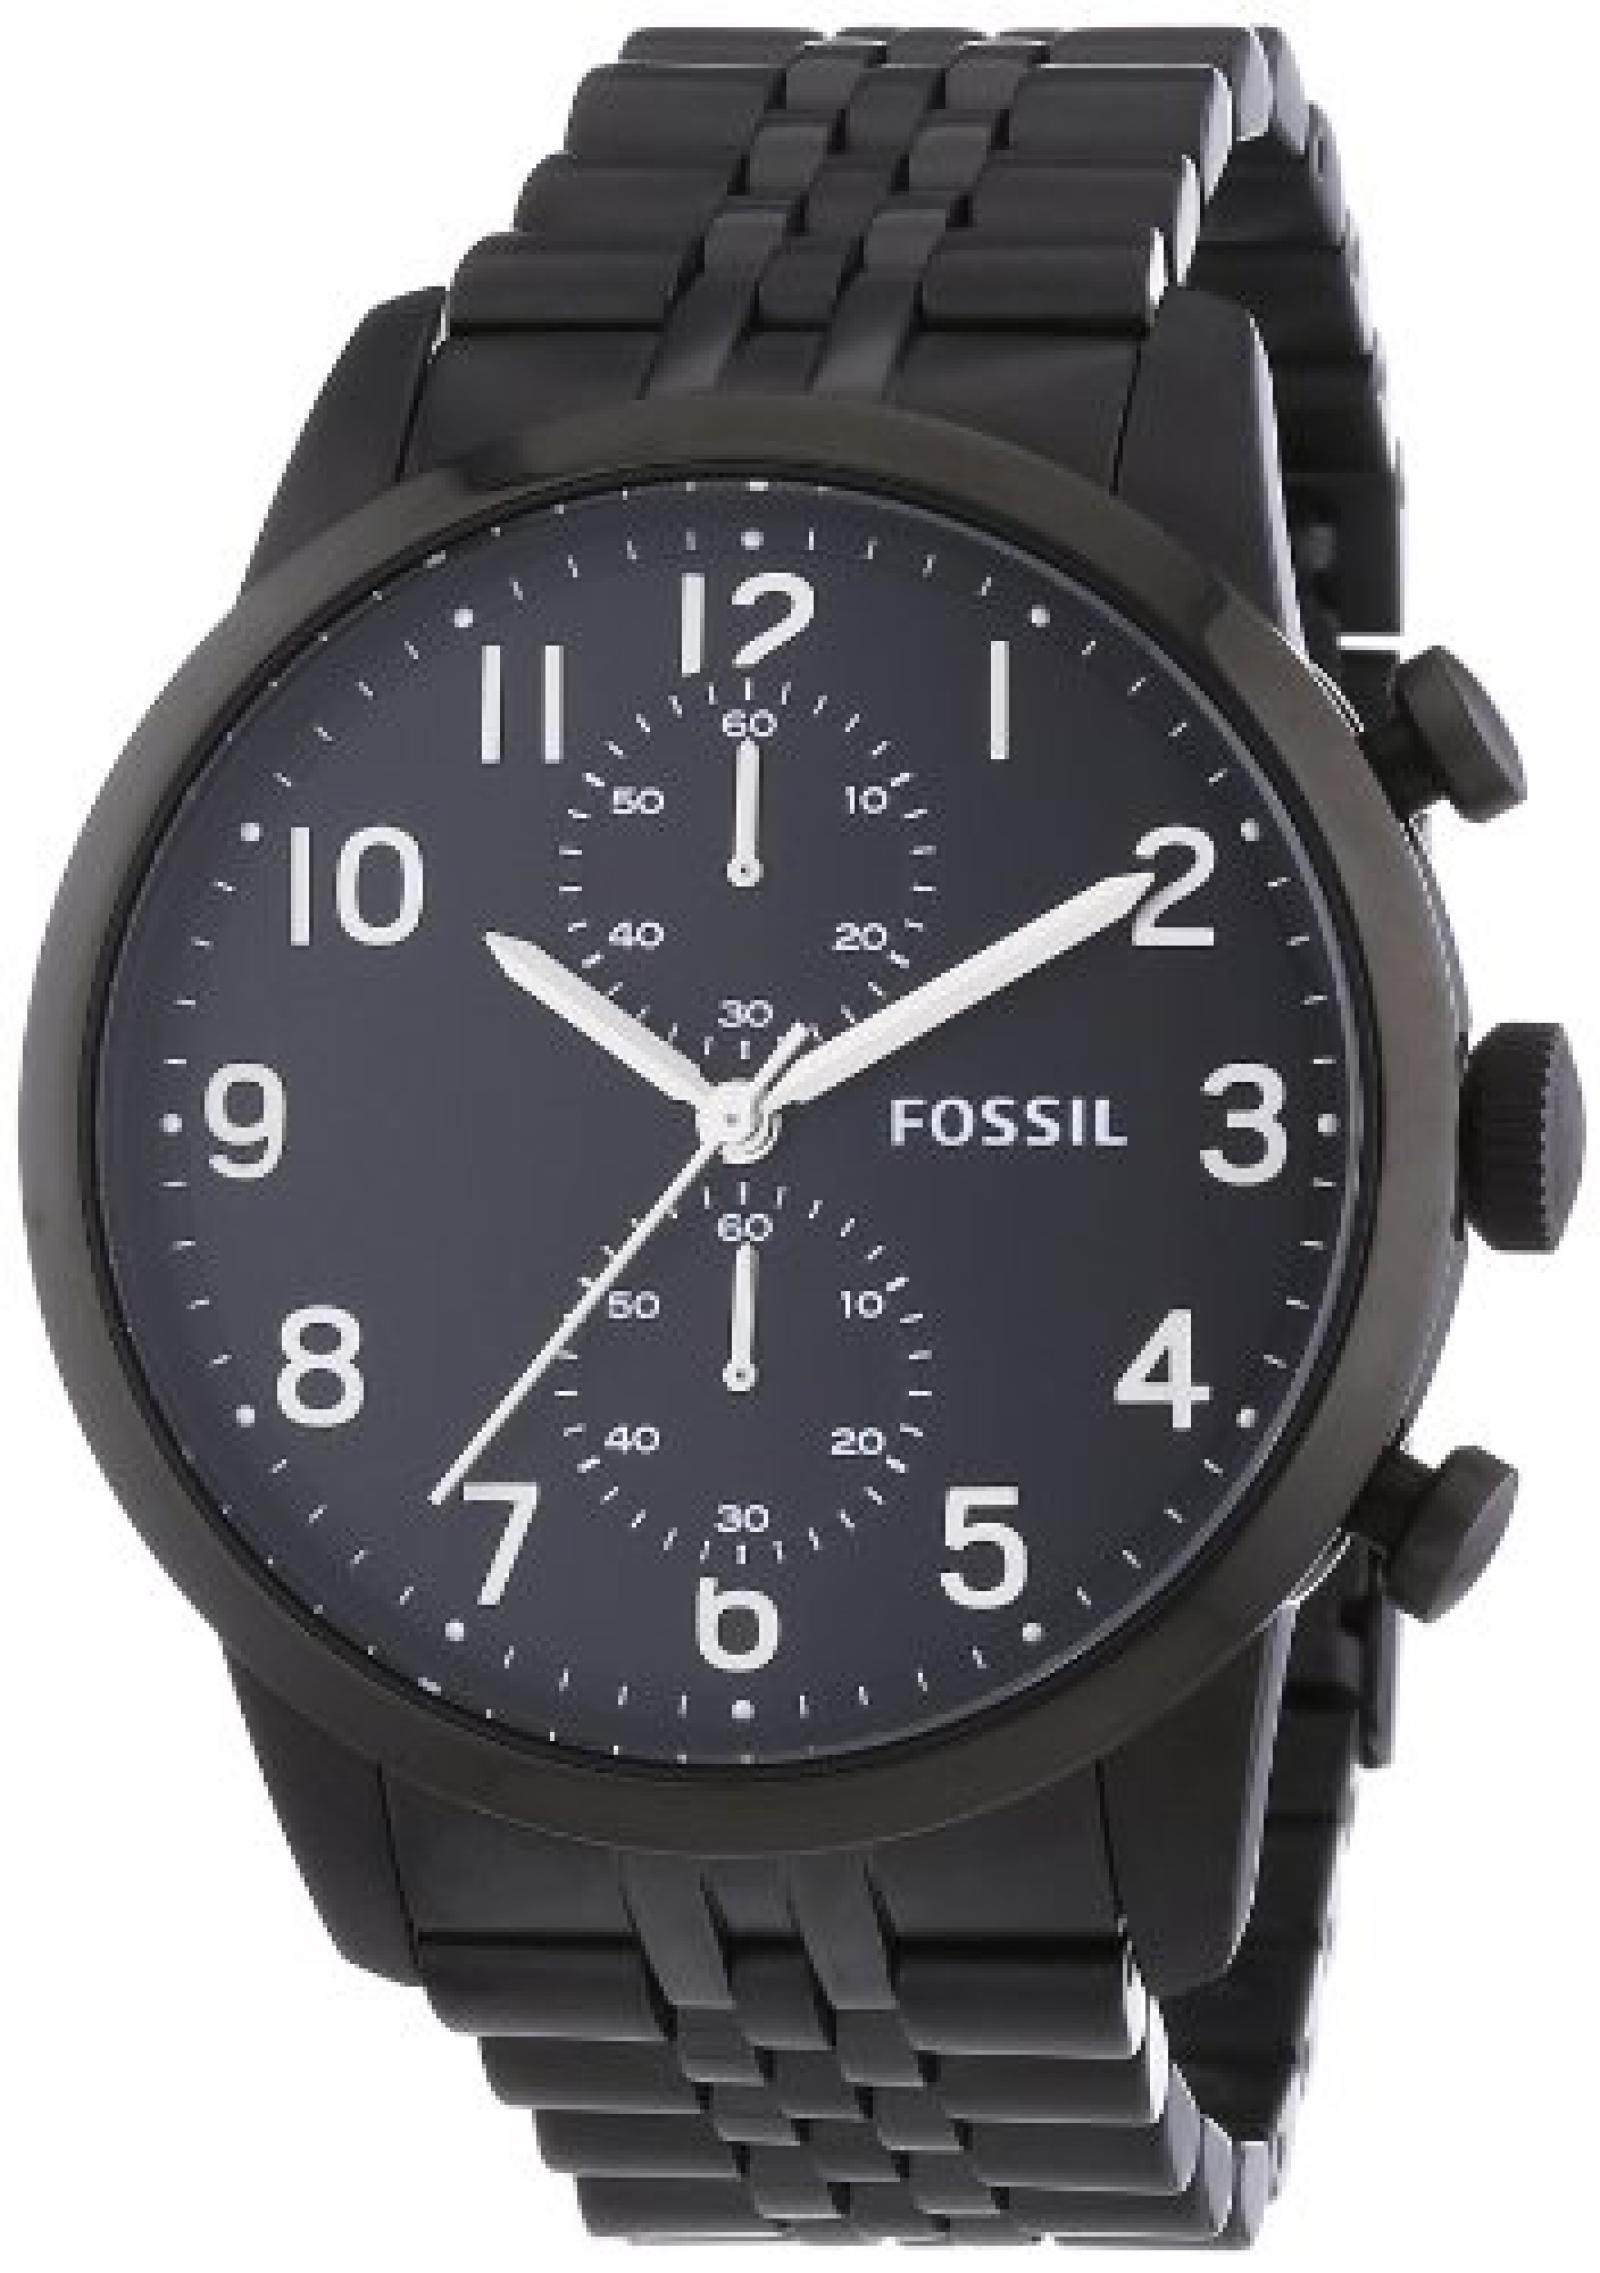 Fossil Herren-Armbanduhr XL Chronograph Quarz Edelstahl FS4877